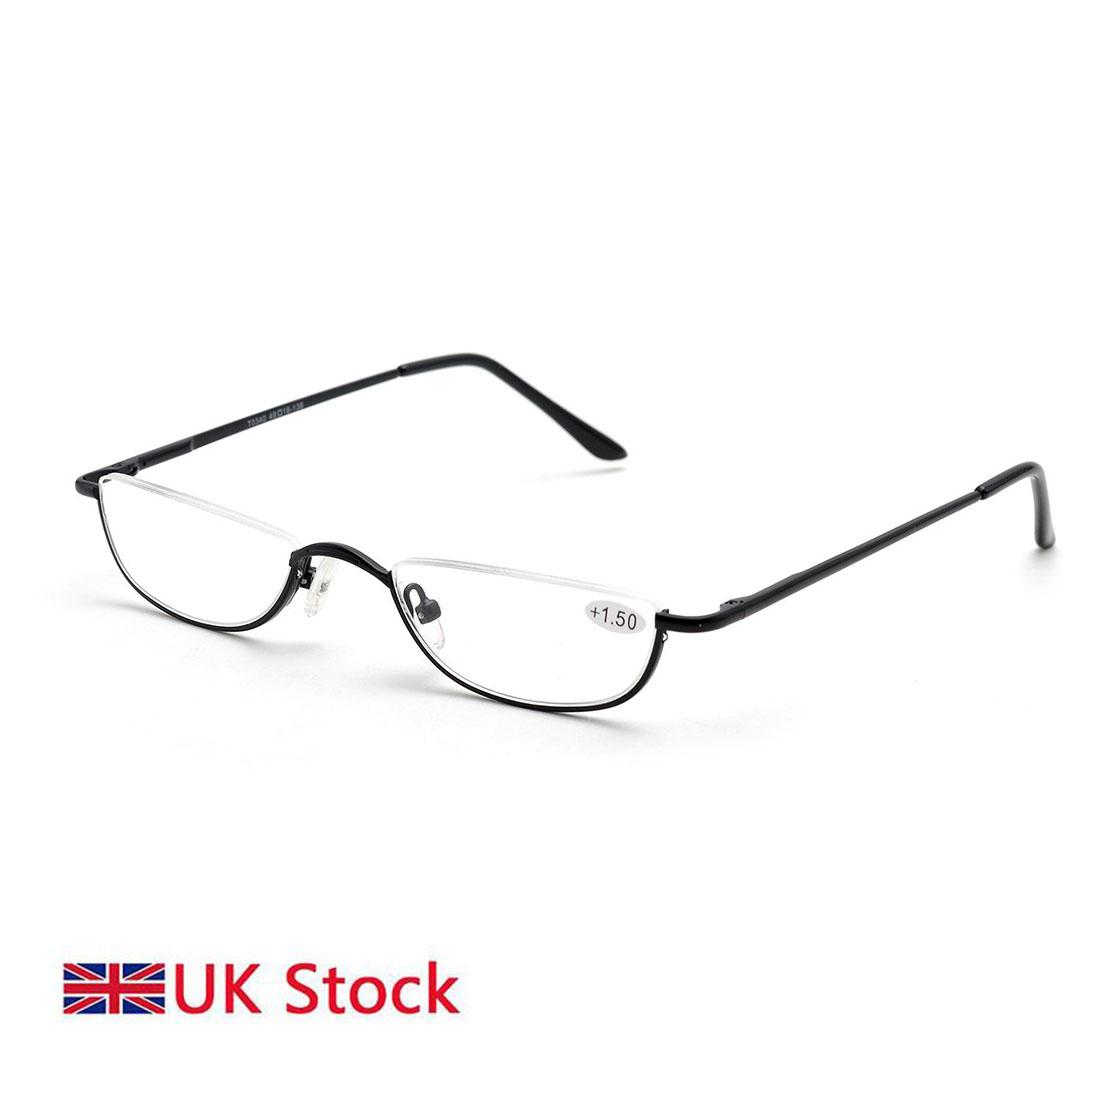 67fd946901f Details about Unisex Half Moon Half Frame Slim Reading Glasses Metal Frame  Spring hinge Eyewea